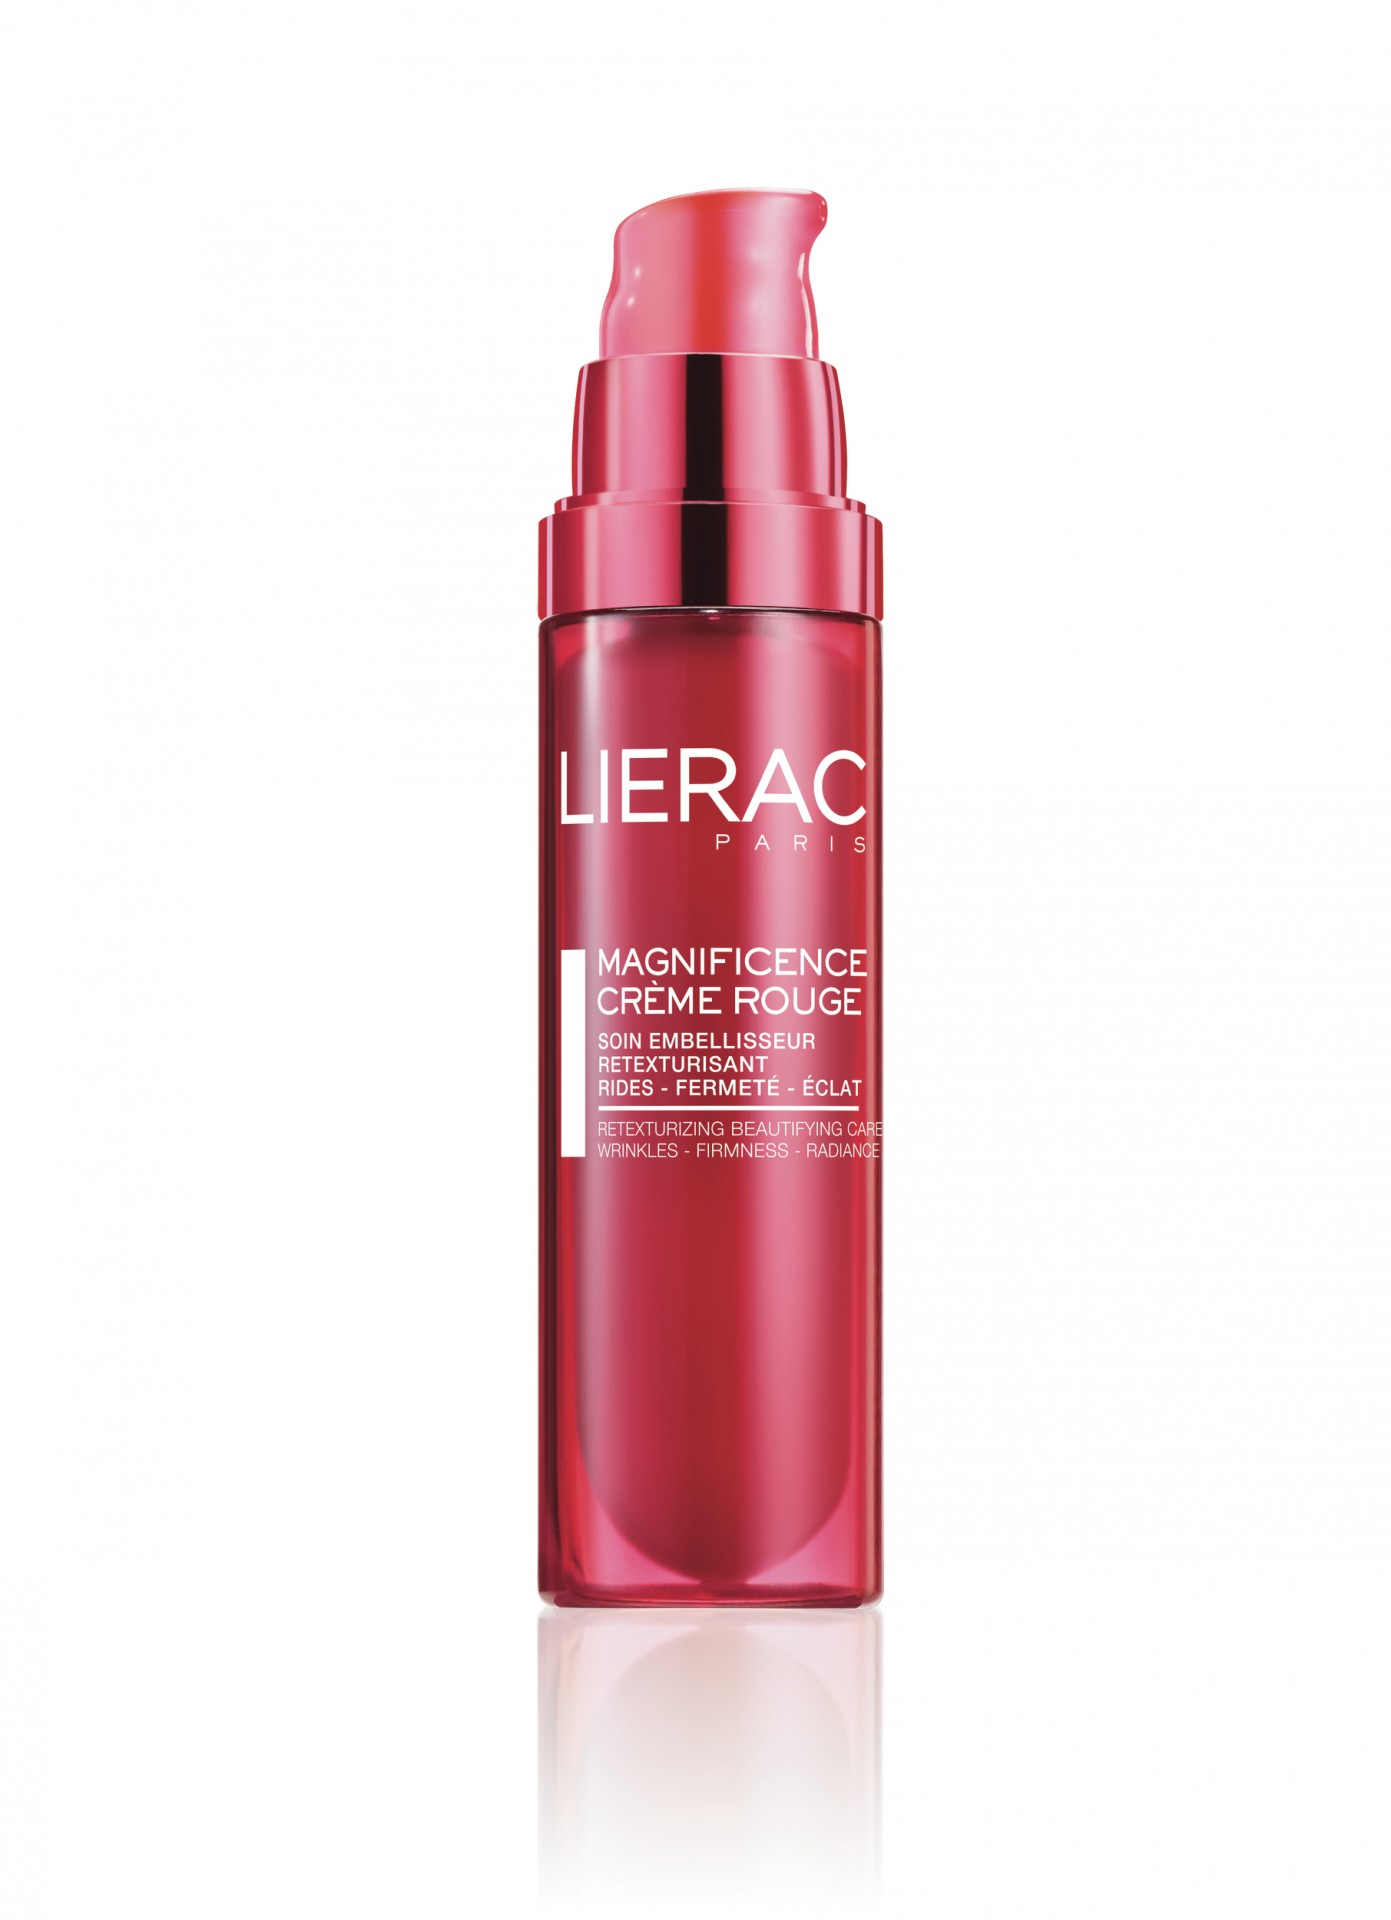 Lierac - Magnificence Creme Rouge 50ml